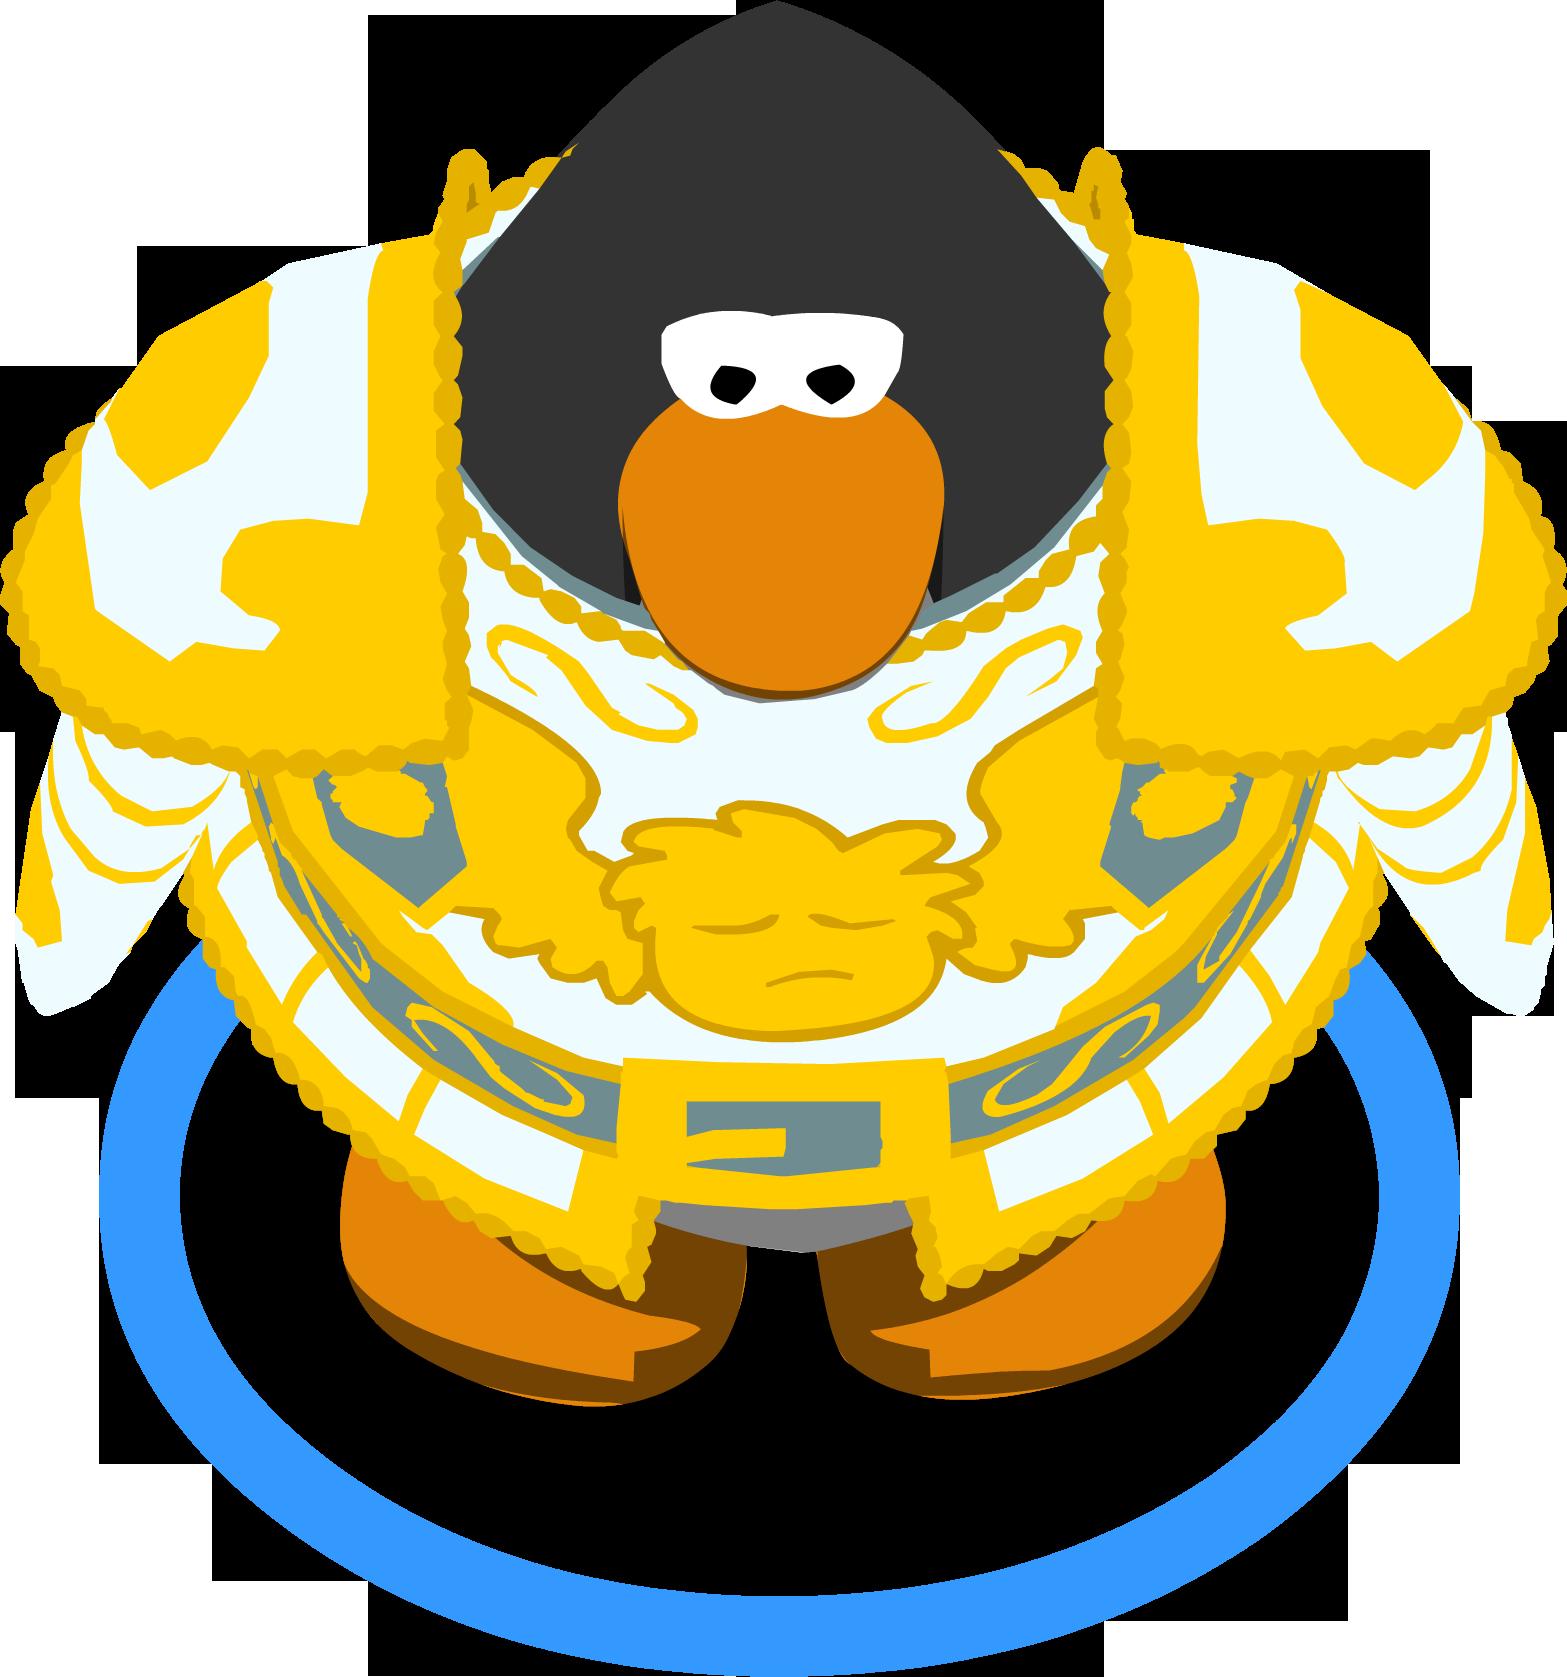 knight clipart body armor